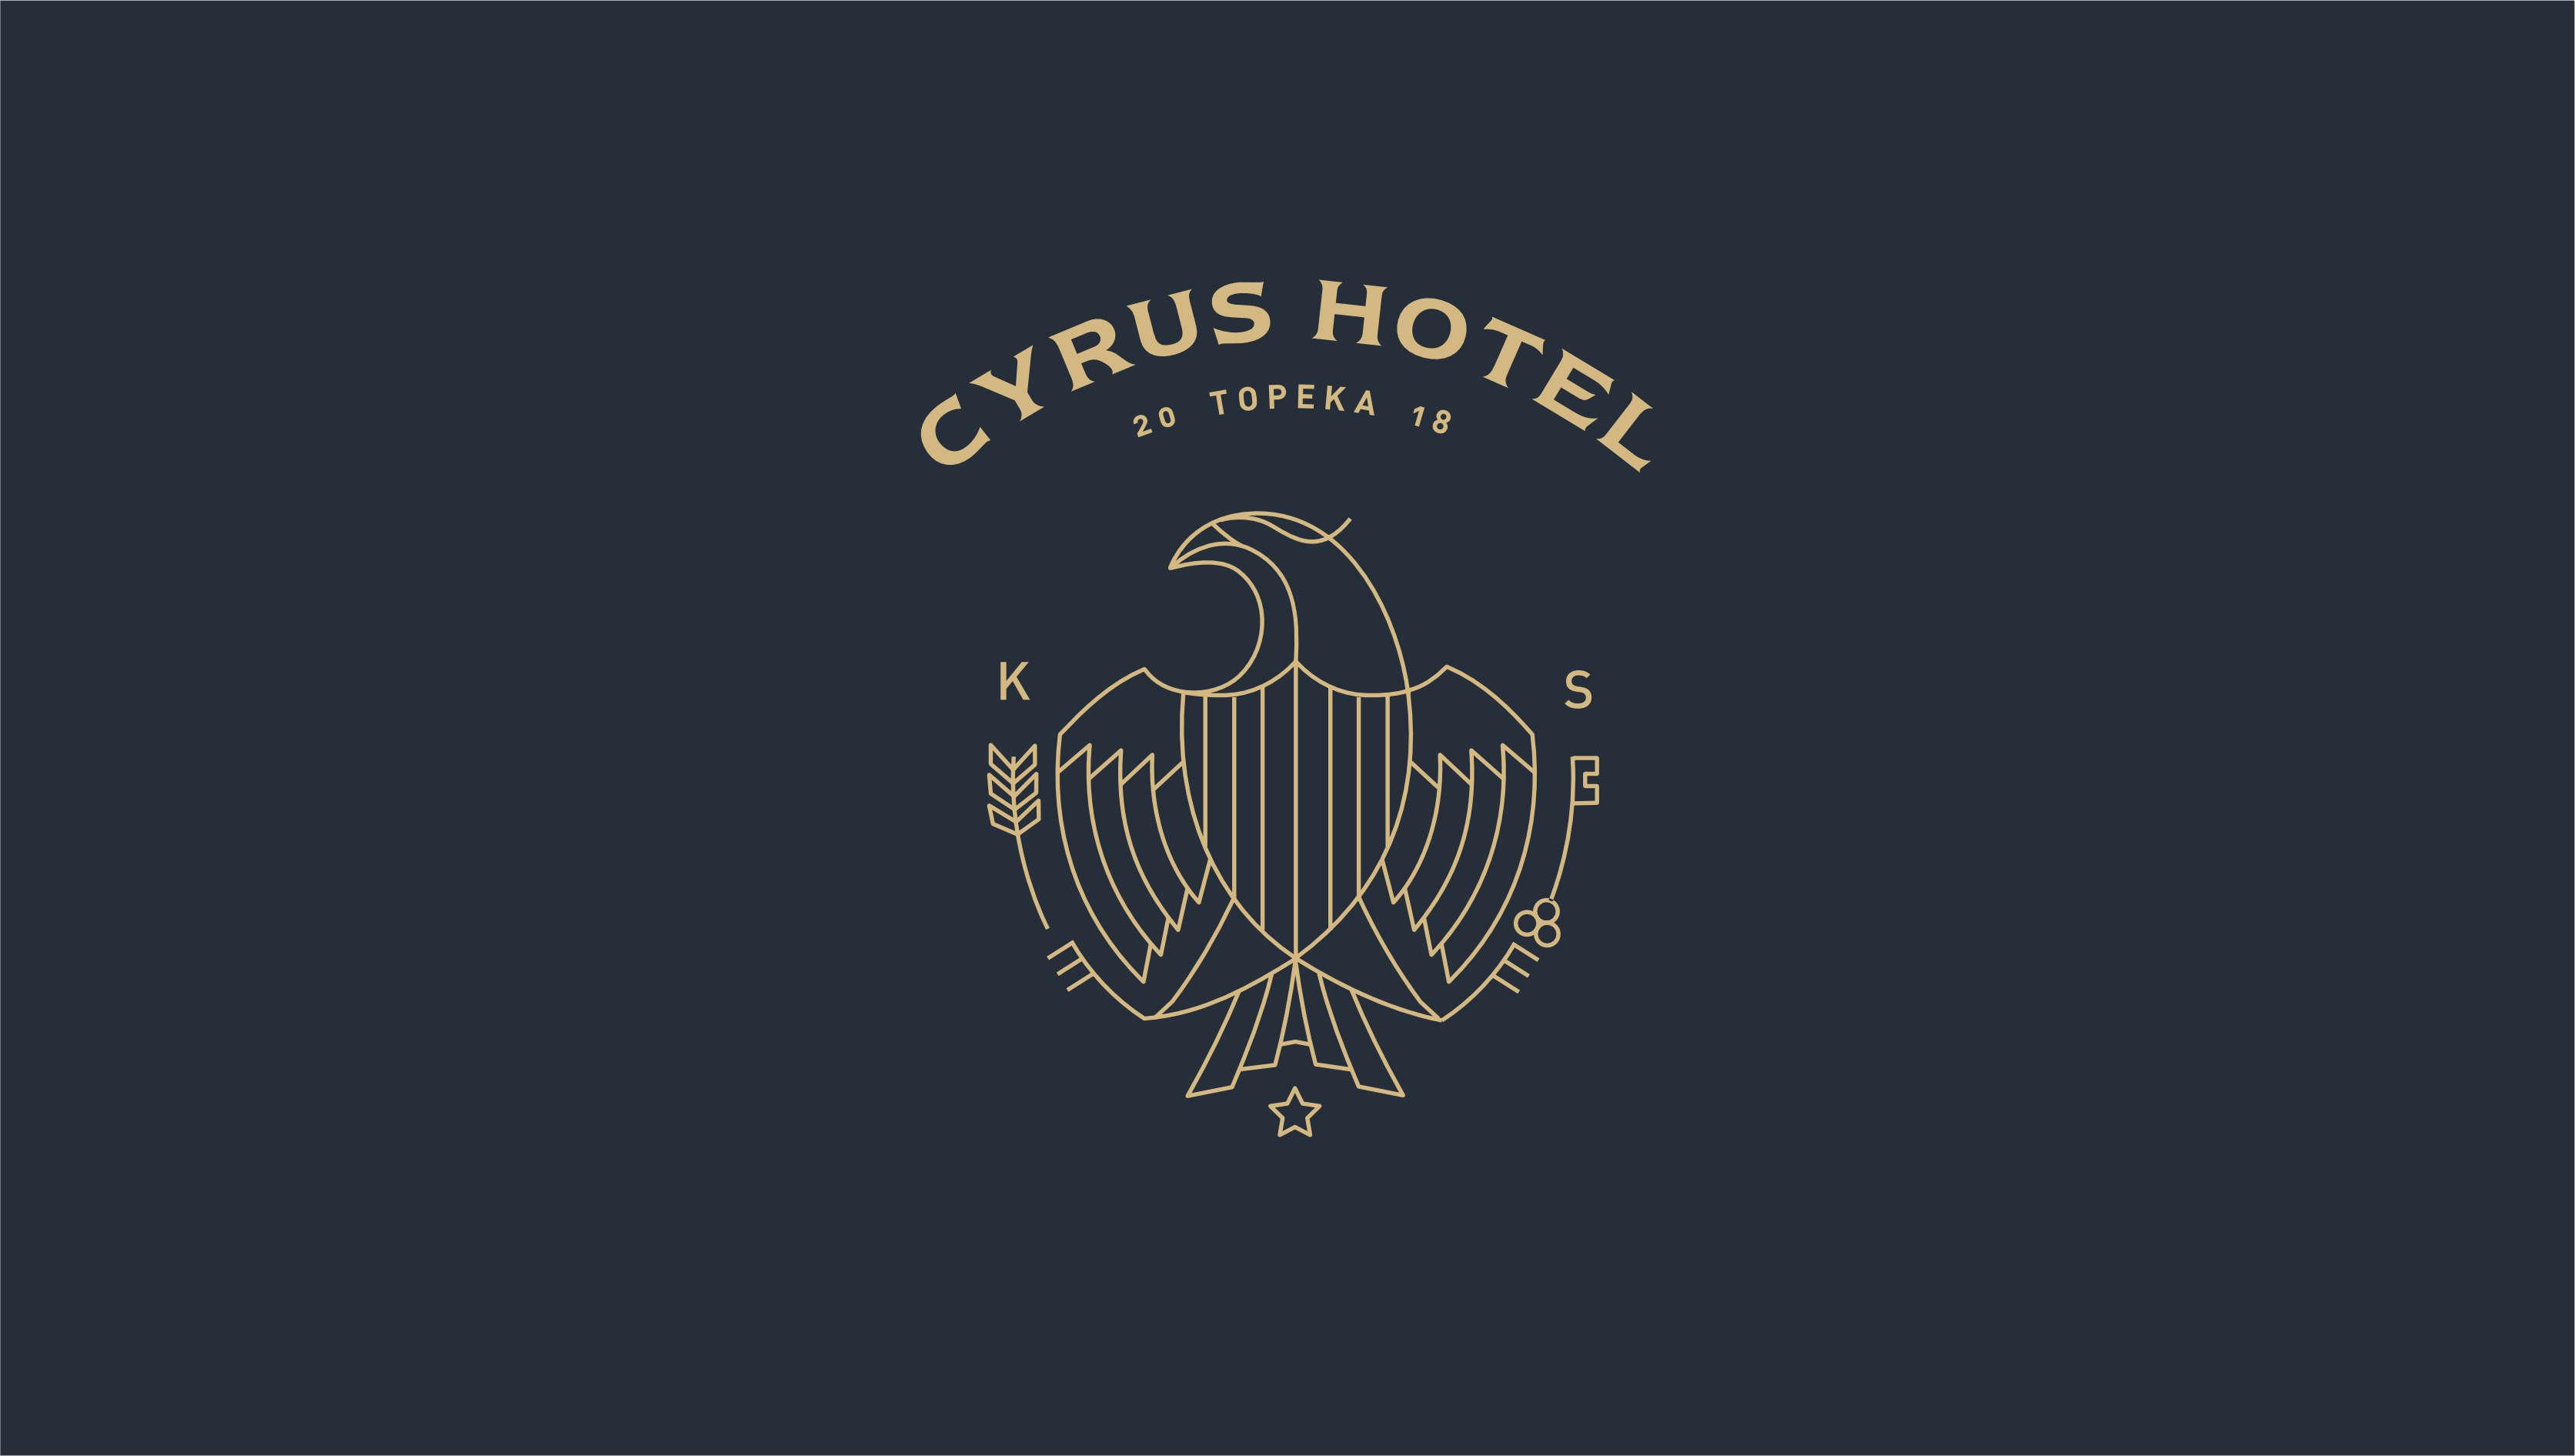 Cyrus Hotel logo on dark blue color field.